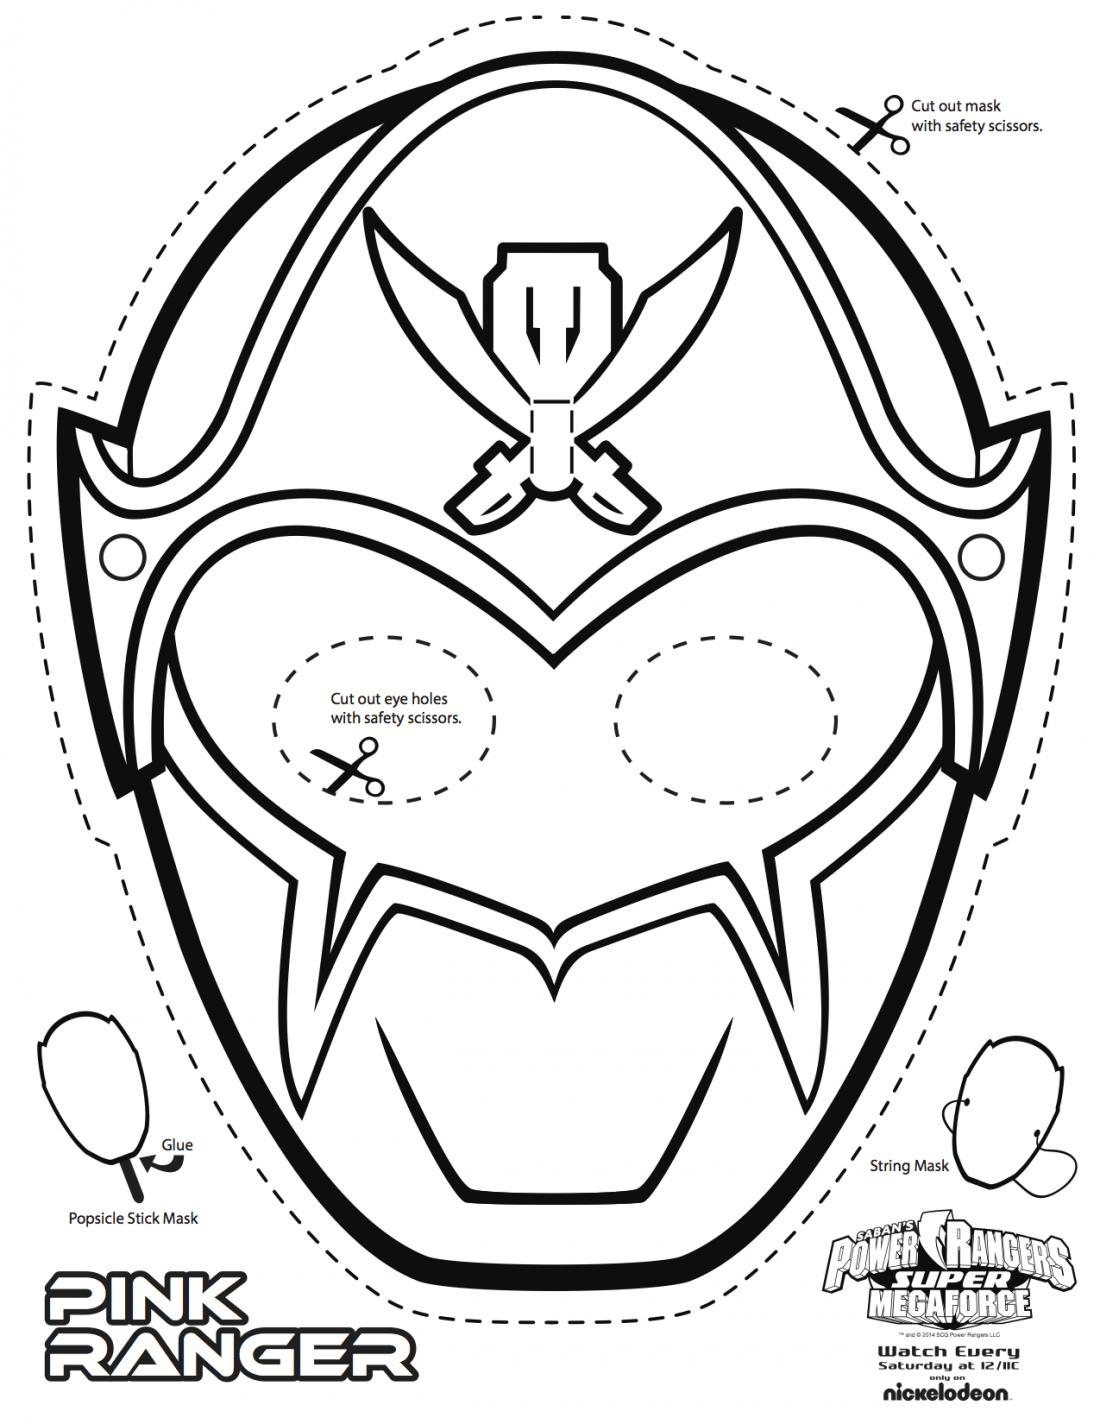 Super mega power rangers printable coloring masks eli - Masque de power rangers ...